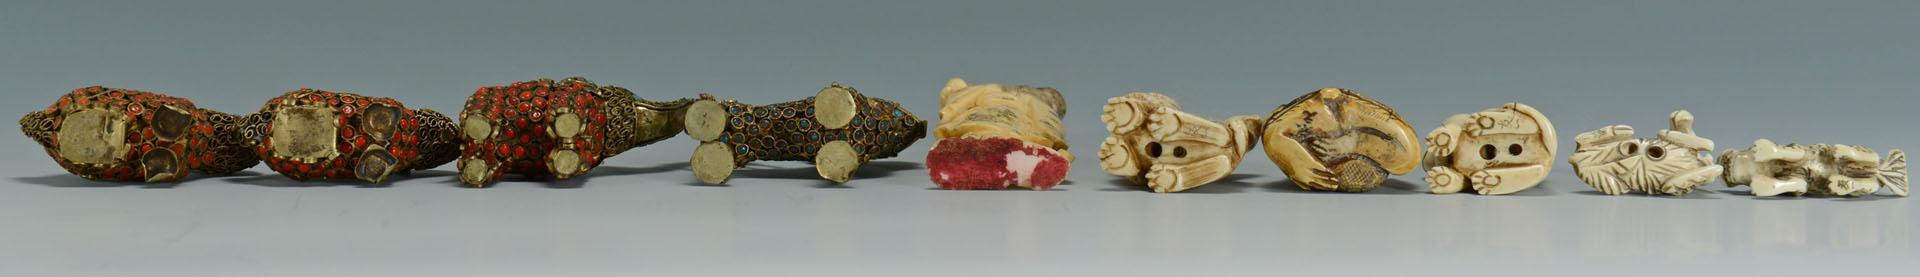 Lot 227: Small Chinese Filigree and Ivory Items, 10 pcs